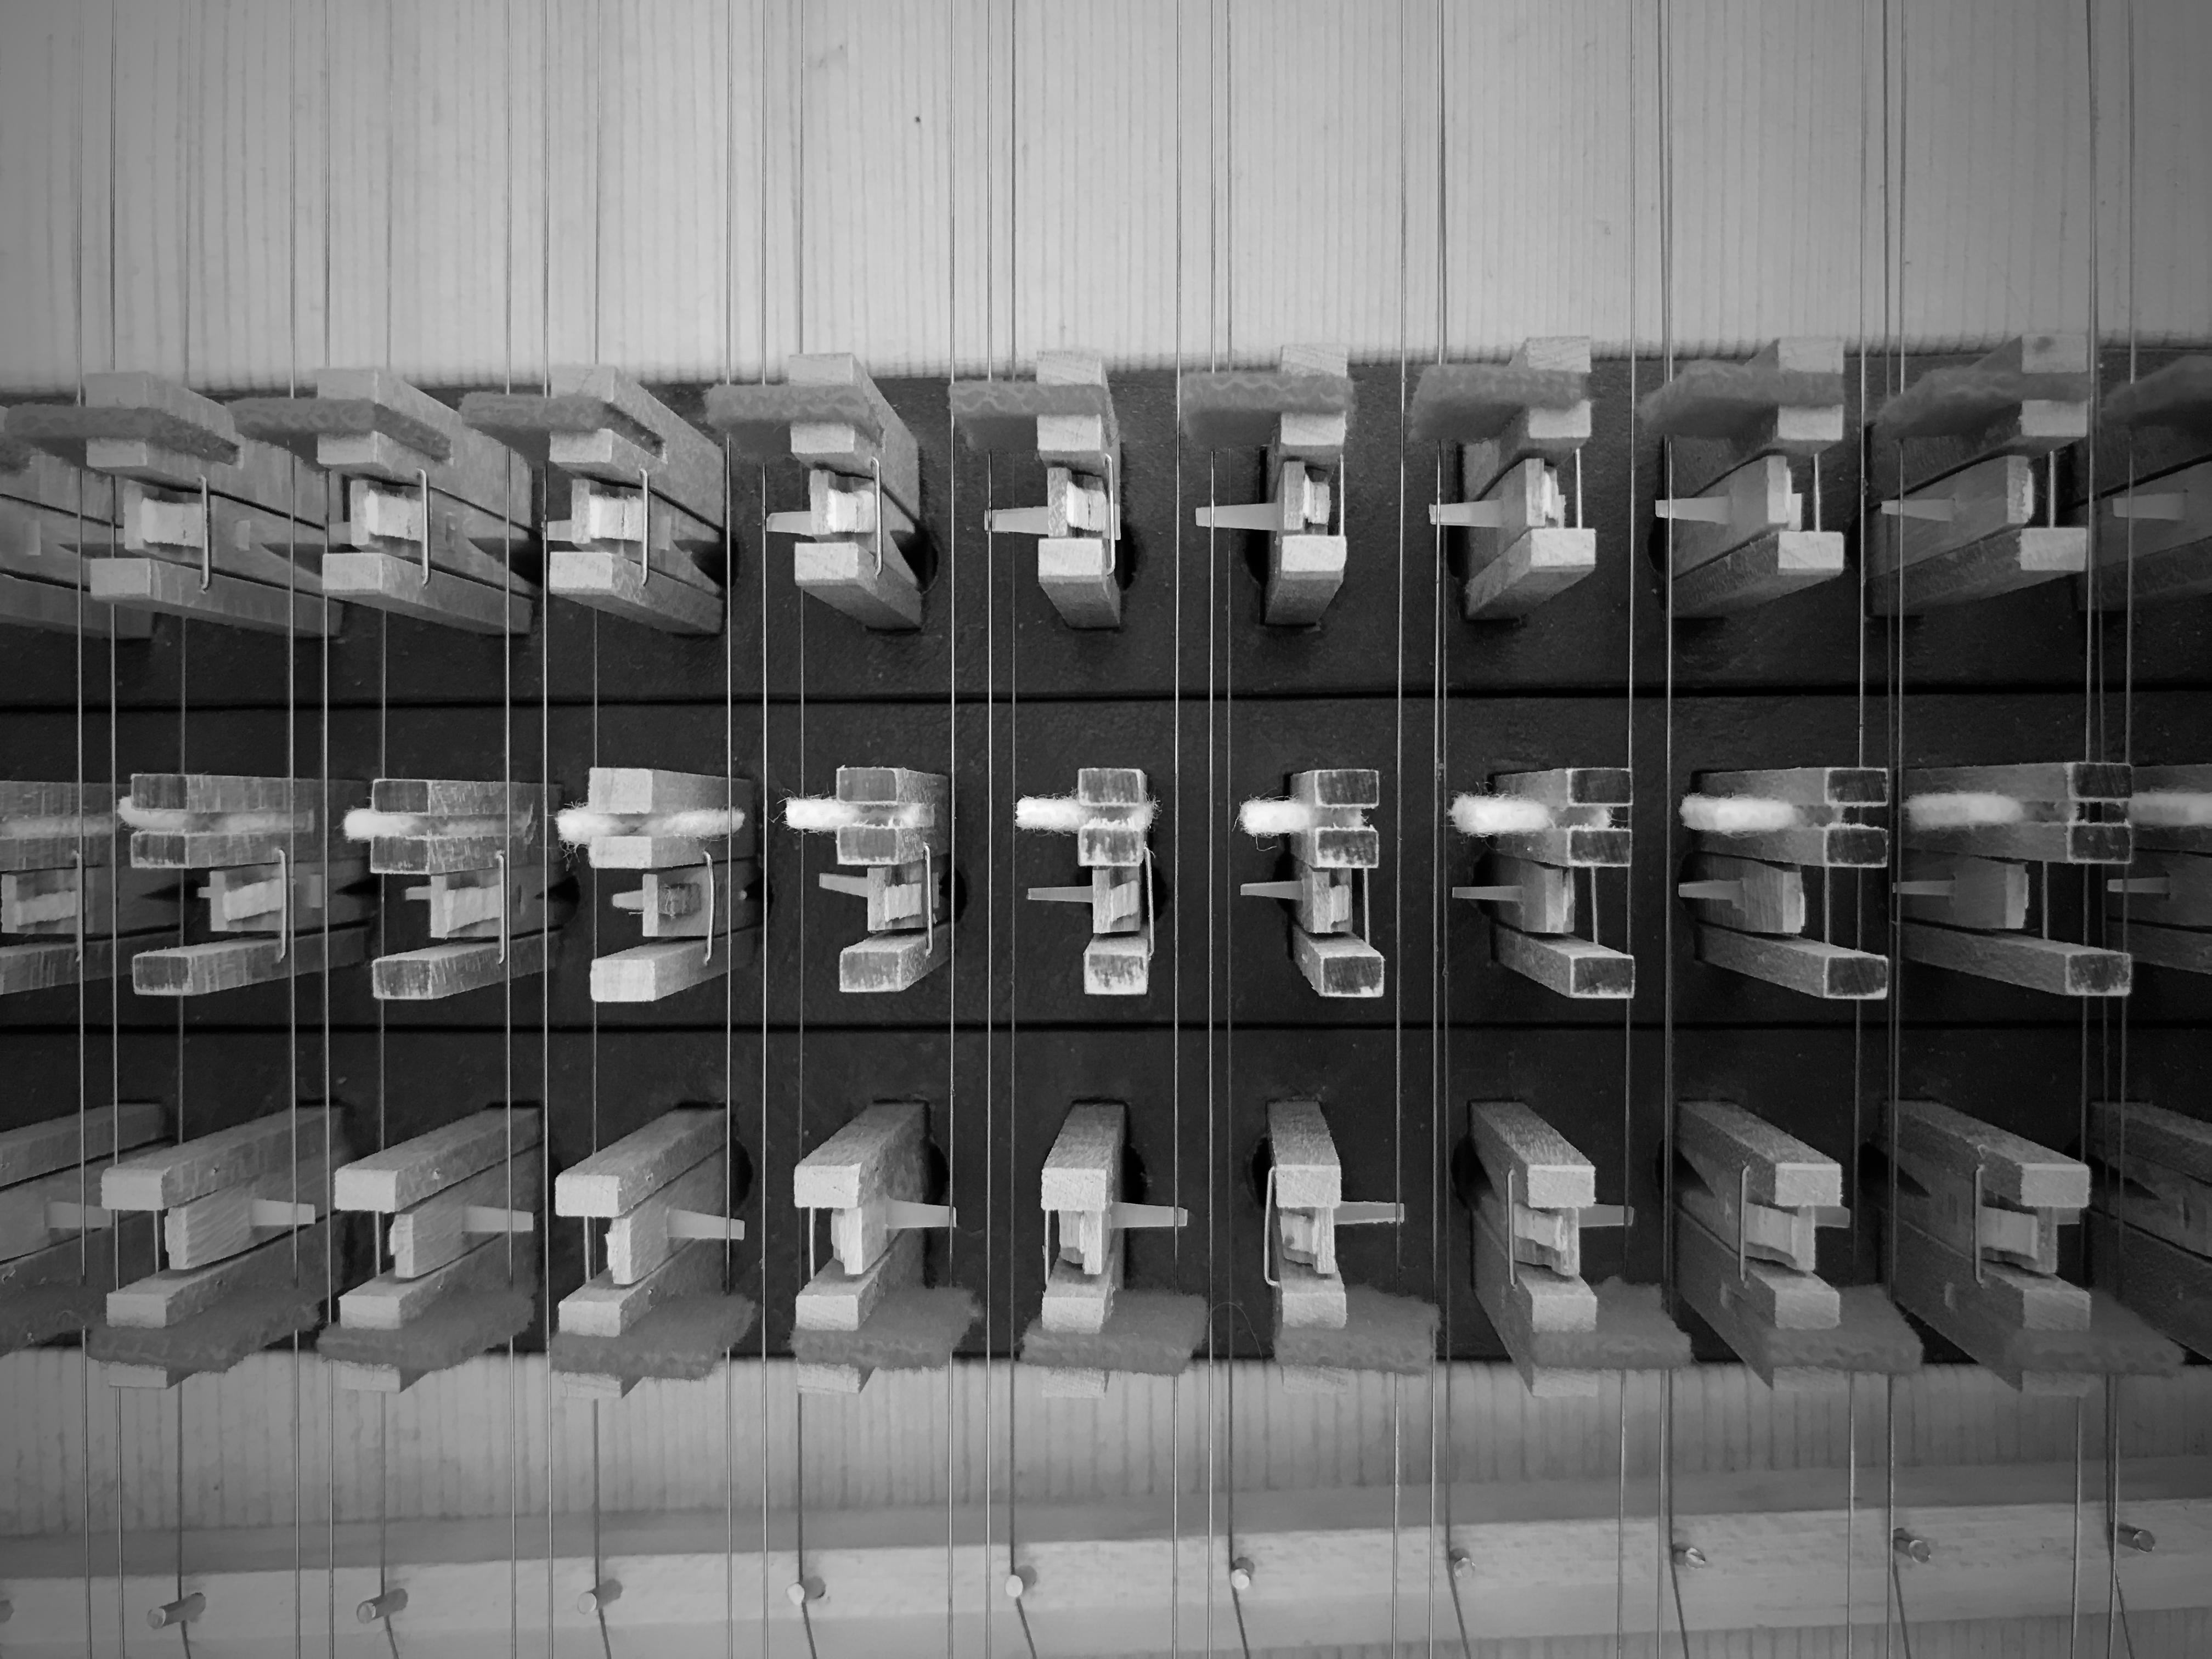 harpsichord jacks